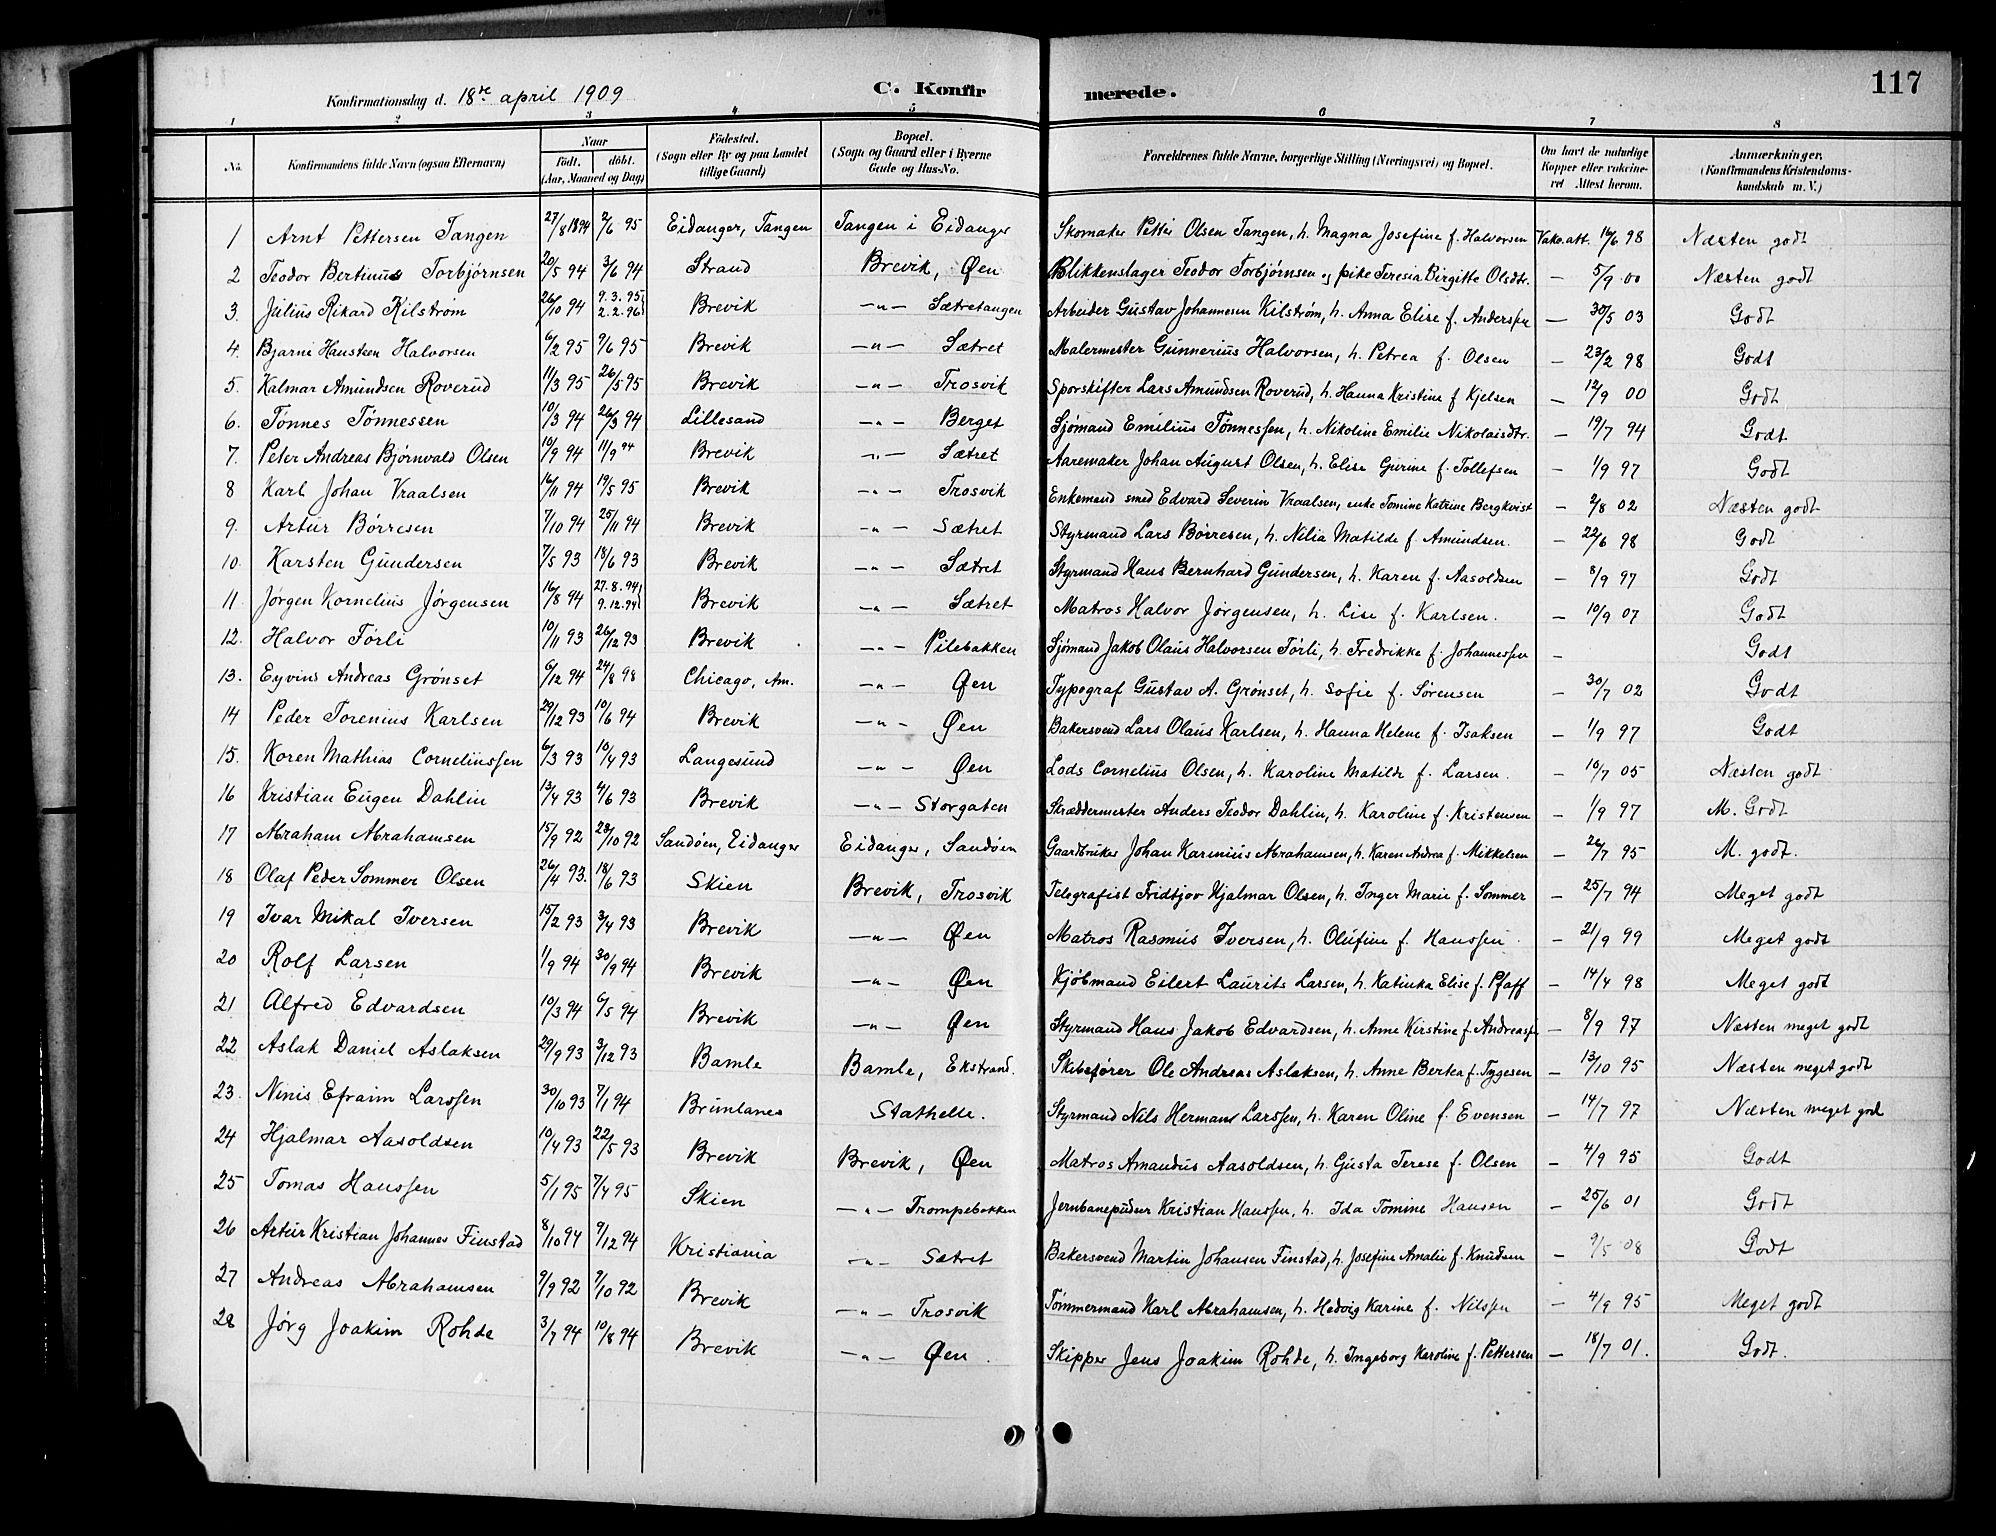 SAKO, Brevik kirkebøker, G/Ga/L0005: Klokkerbok nr. 5, 1901-1924, s. 117